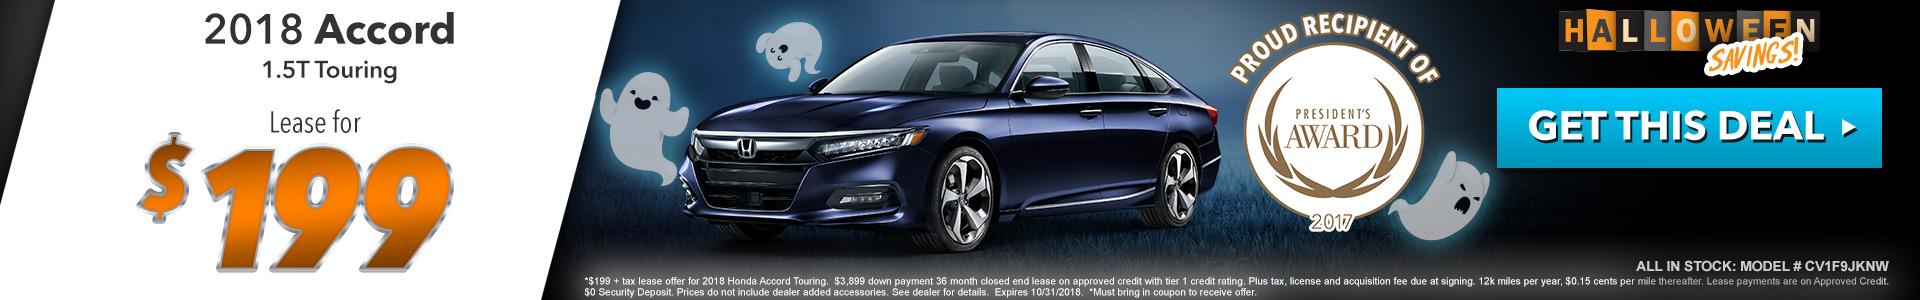 Honda Accord Touring $199 Lease